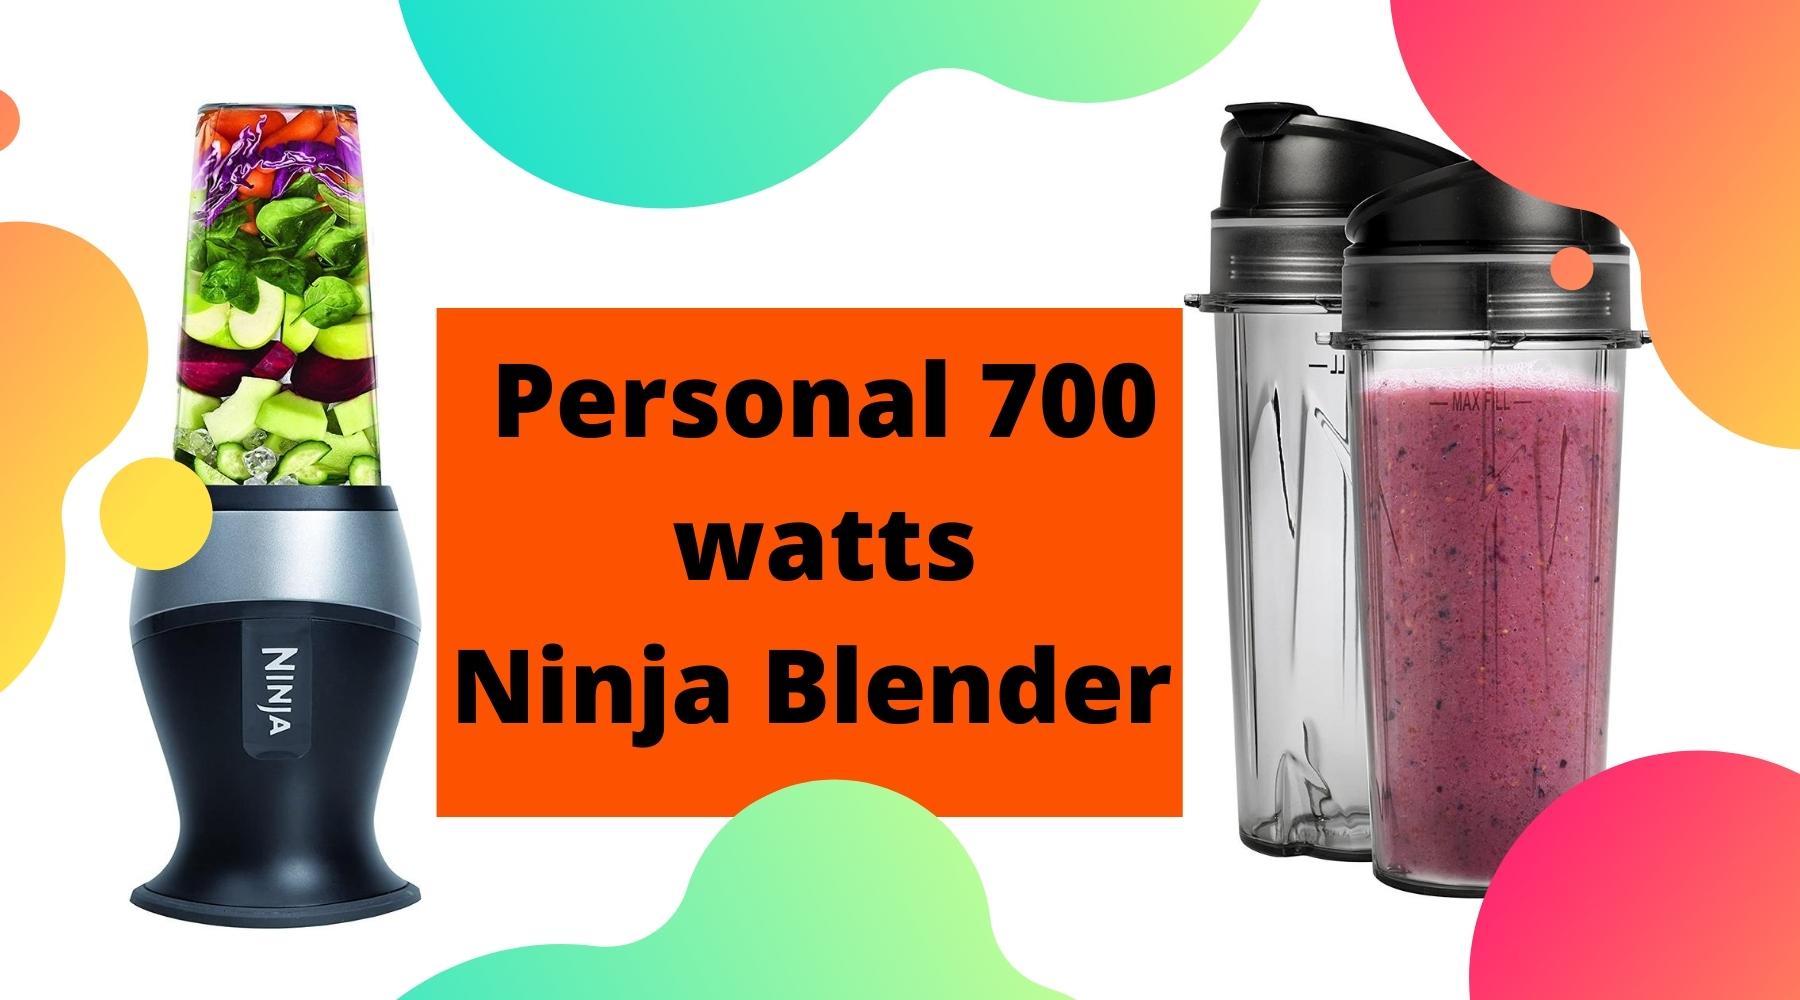 Personal 700 watts ninja blender